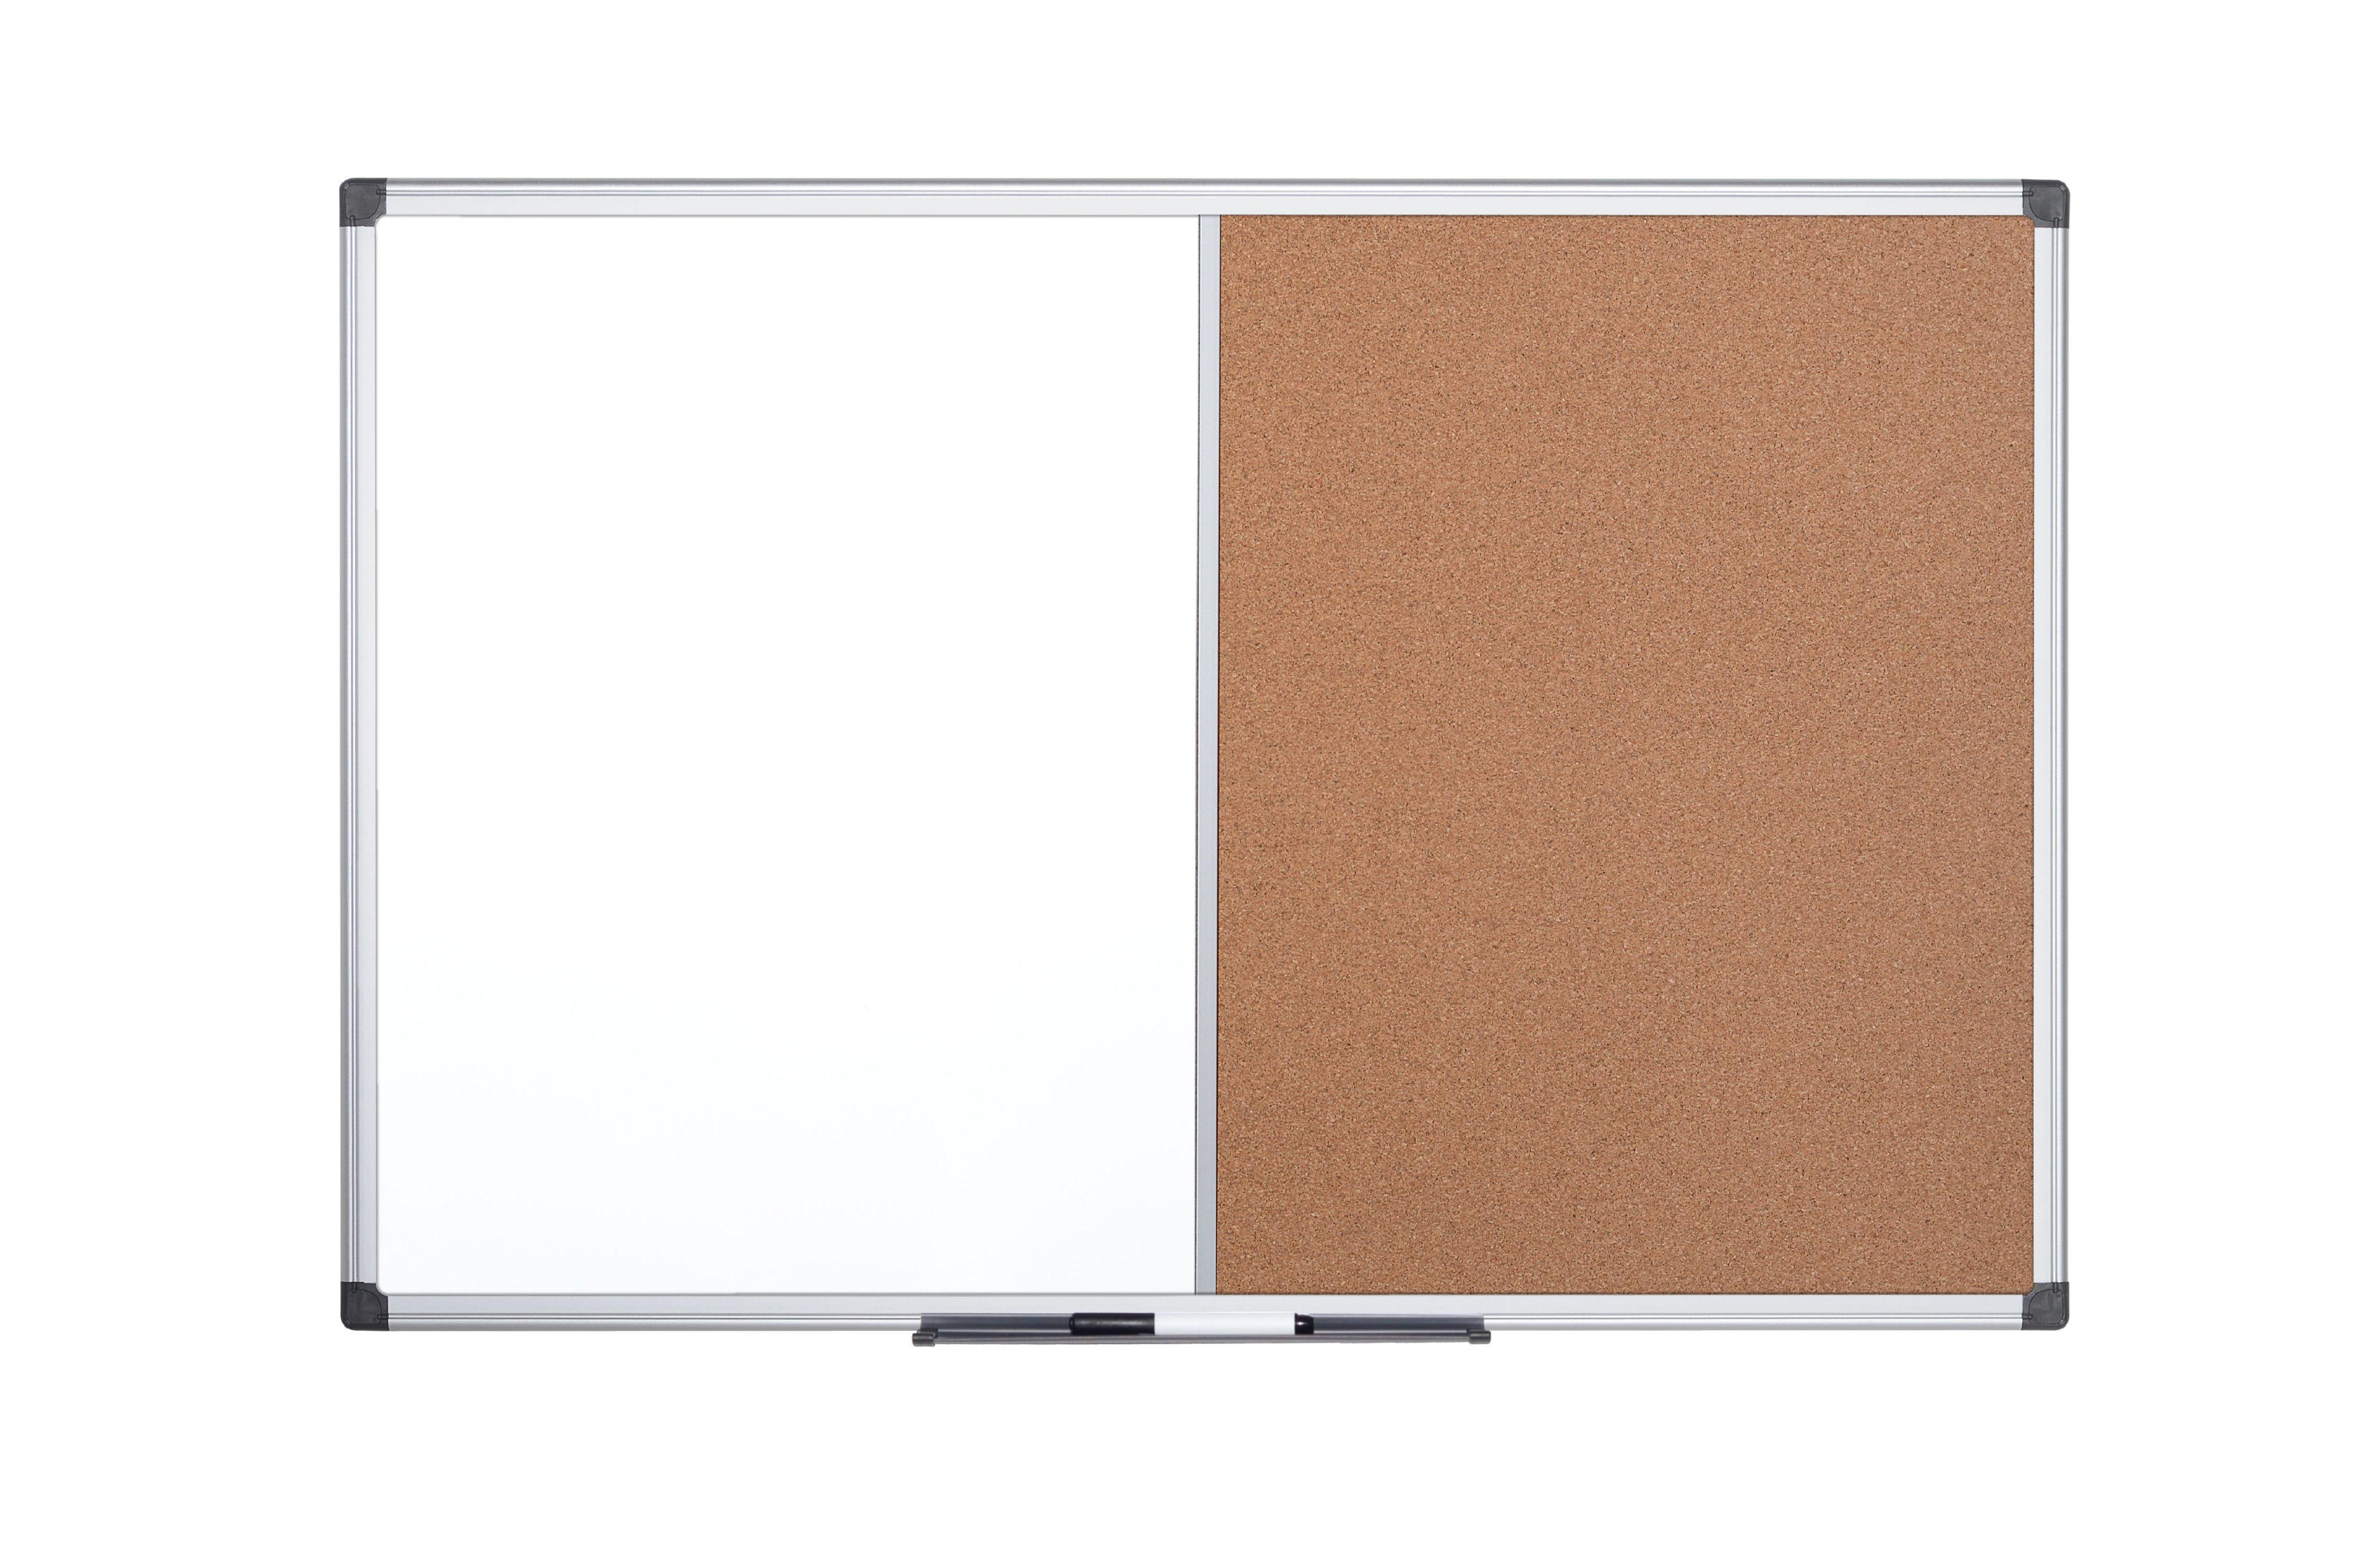 Alu Frame comboBoard 120x90cm